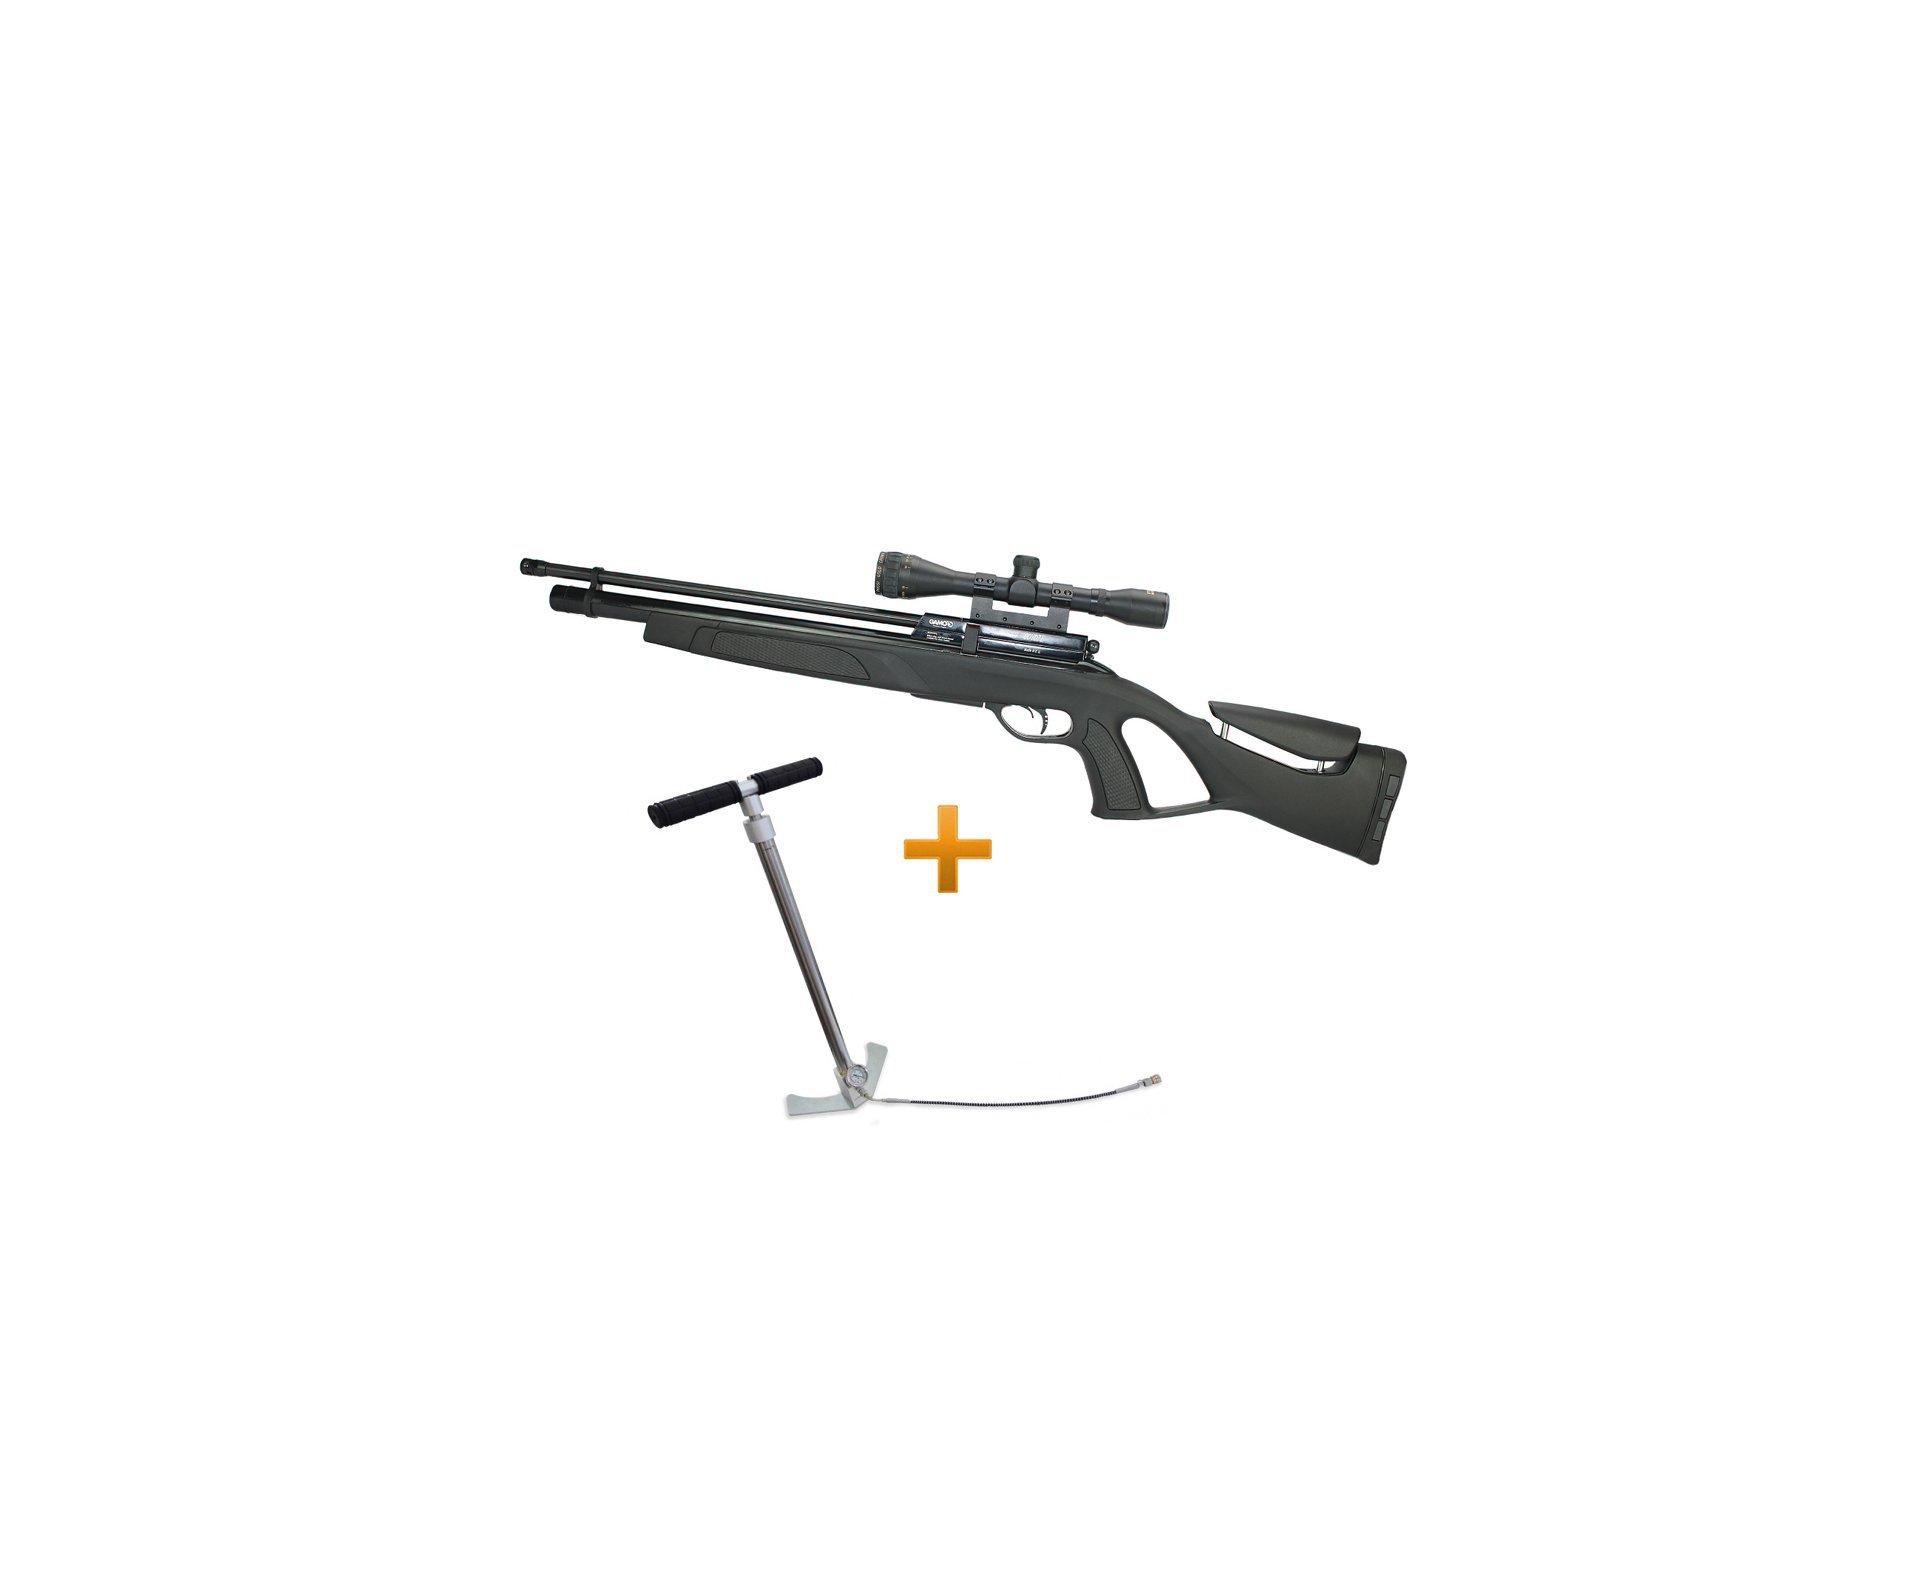 Carabina Pcp Gamo Coyote Black Cal 5,5mm + Luneta 4x32 Gold Crow Rossi + Bomba Hand Pump Inox - Gamo